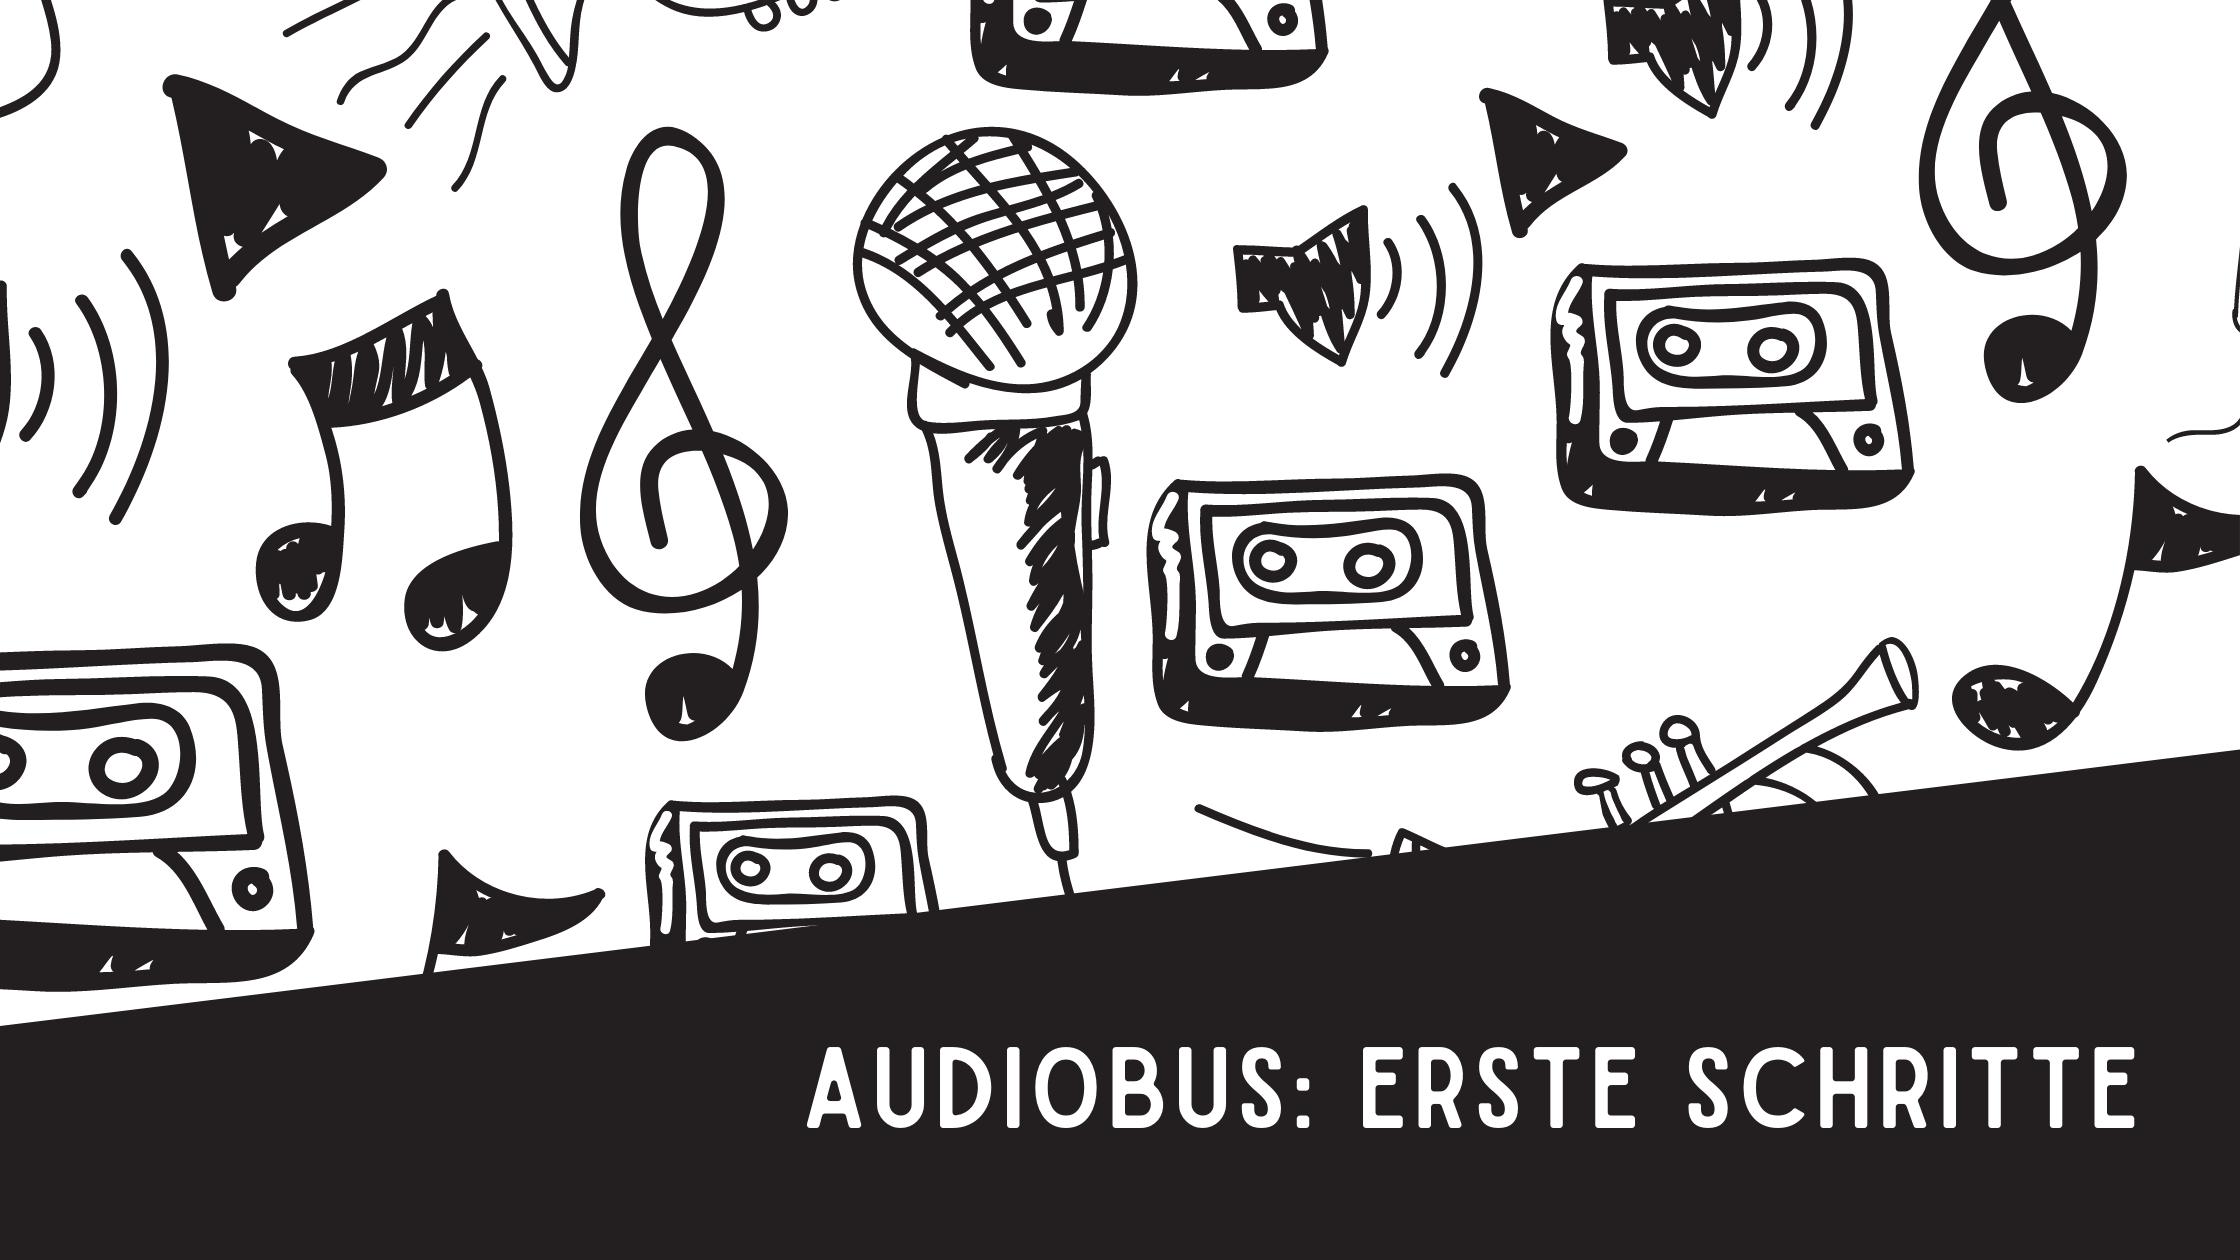 Audiobus Erste Schritte